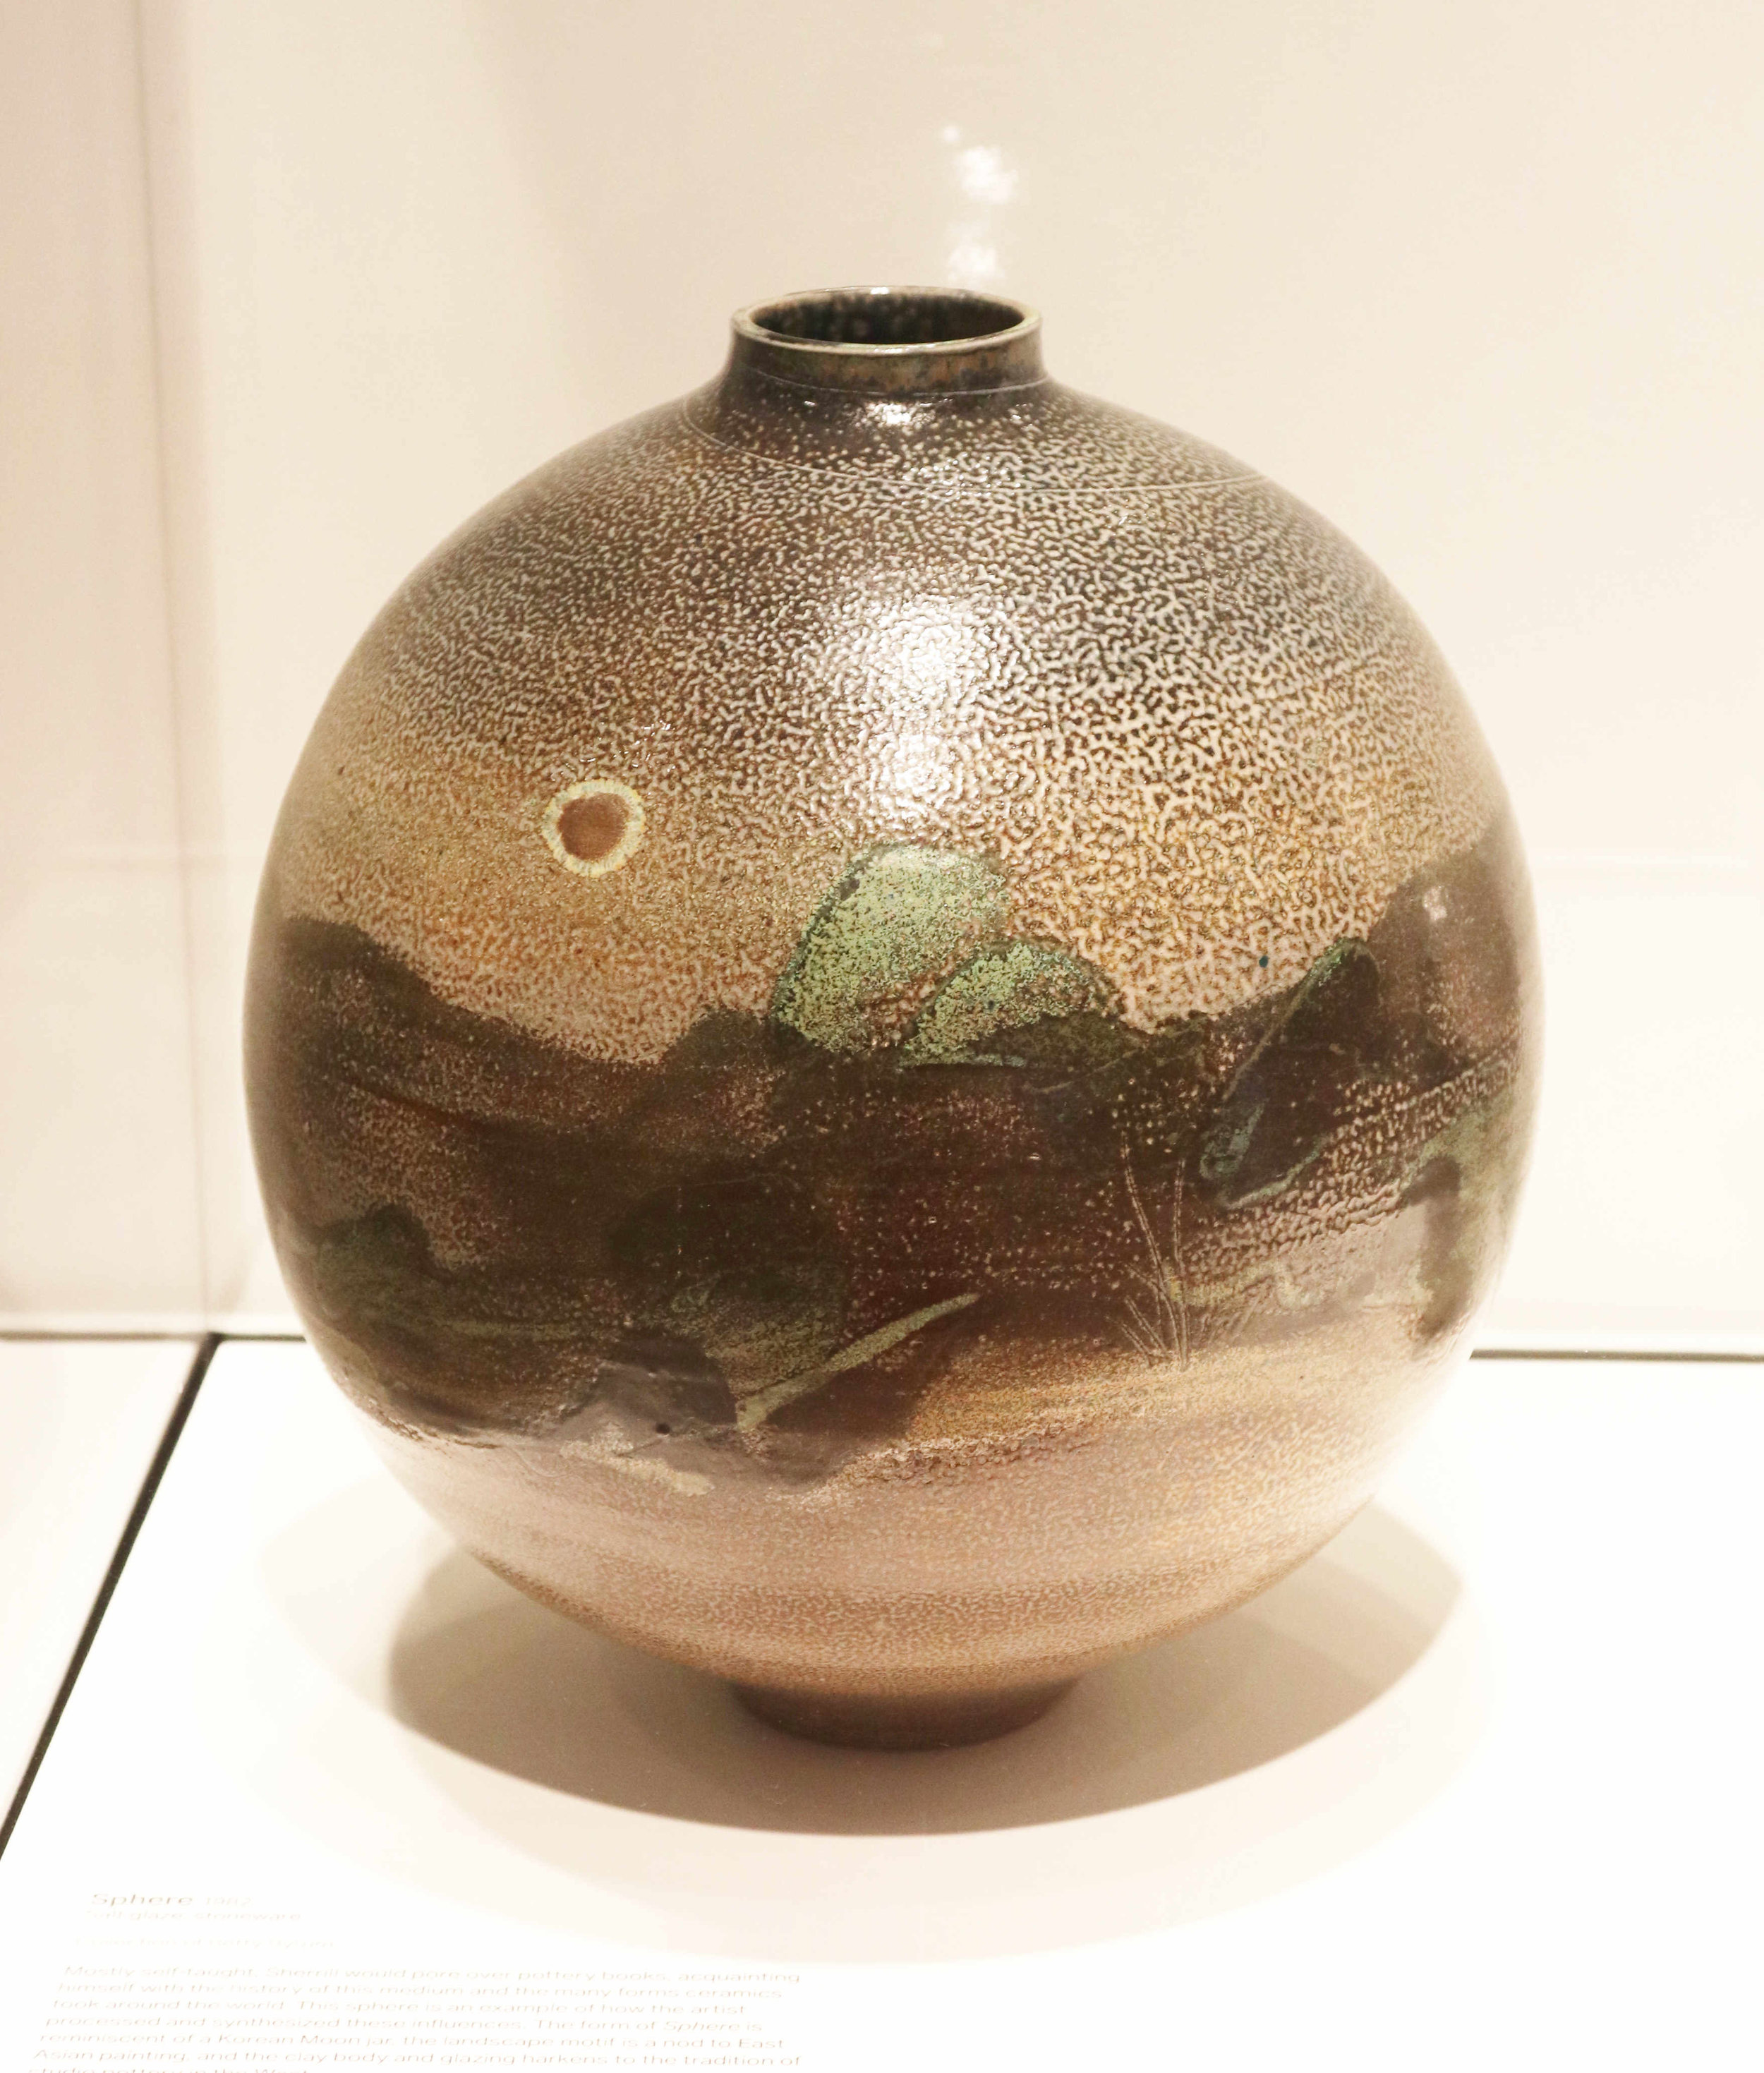 Michael Sherrill, Sphere, 1982. Salt glaze, stoneware.